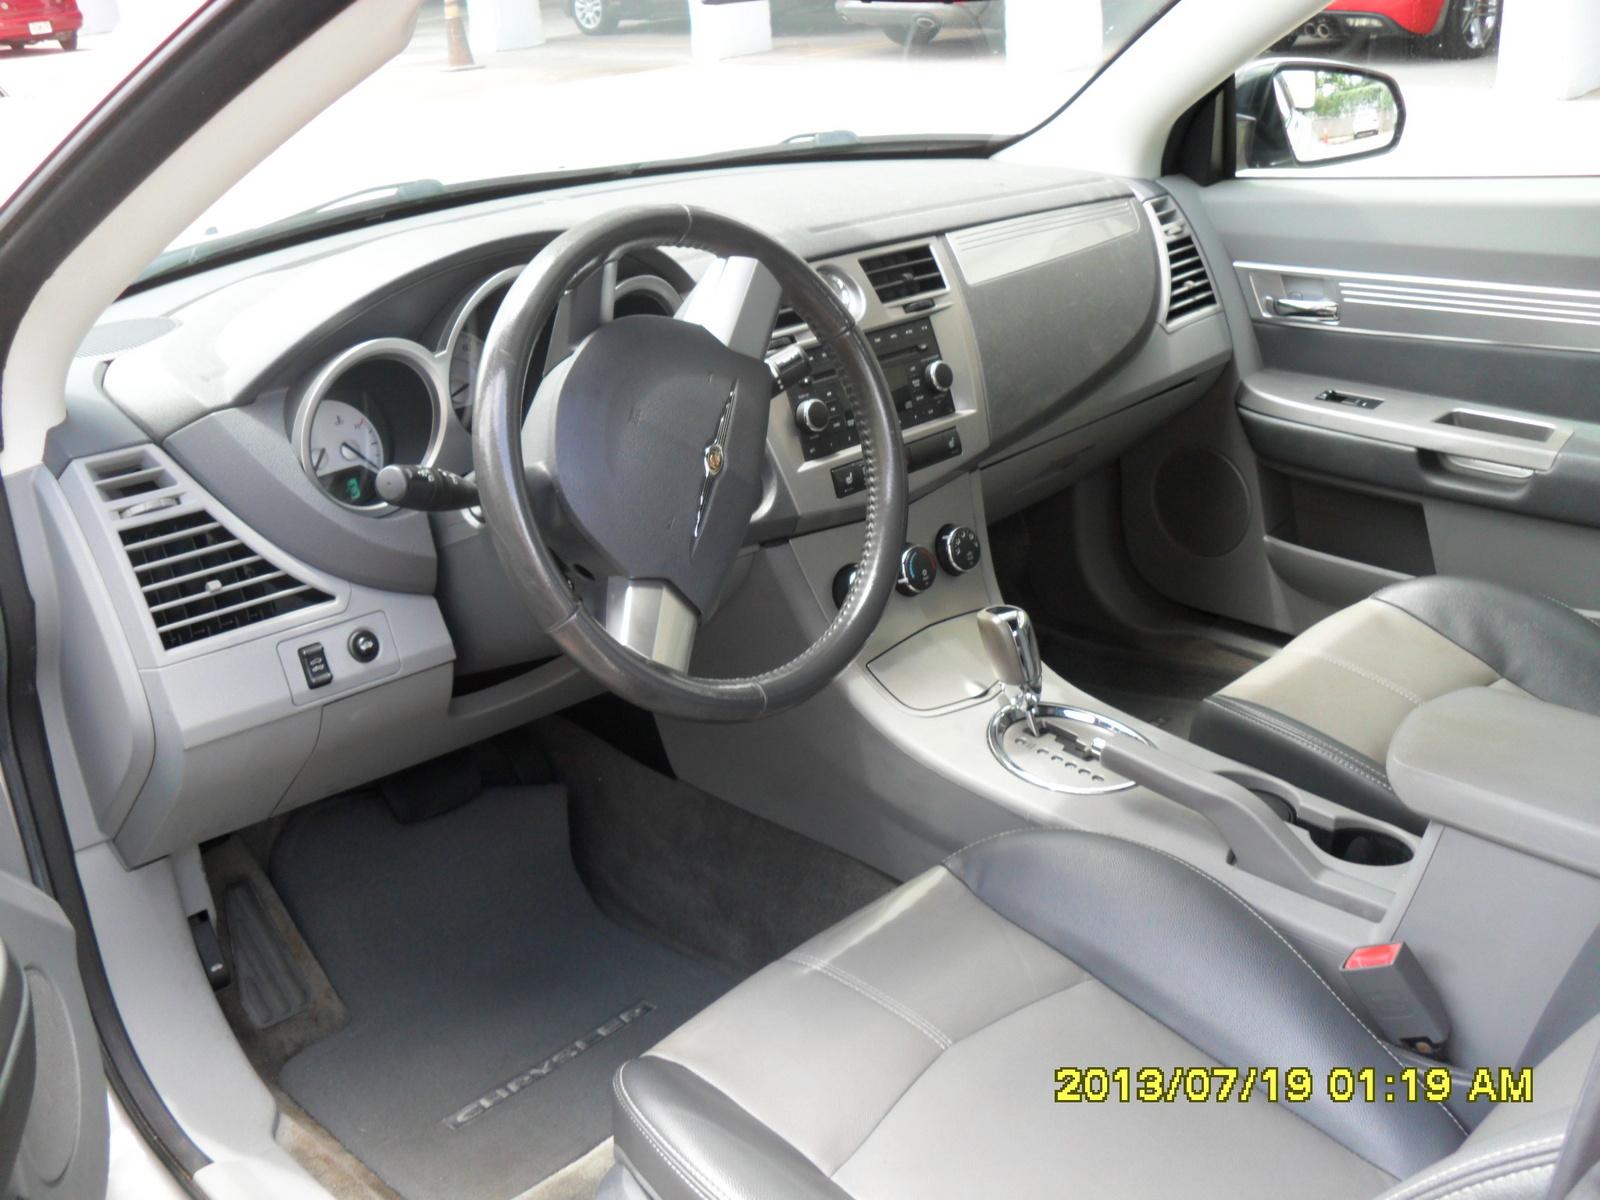 2008 Chrysler Sebring Pictures Cargurus